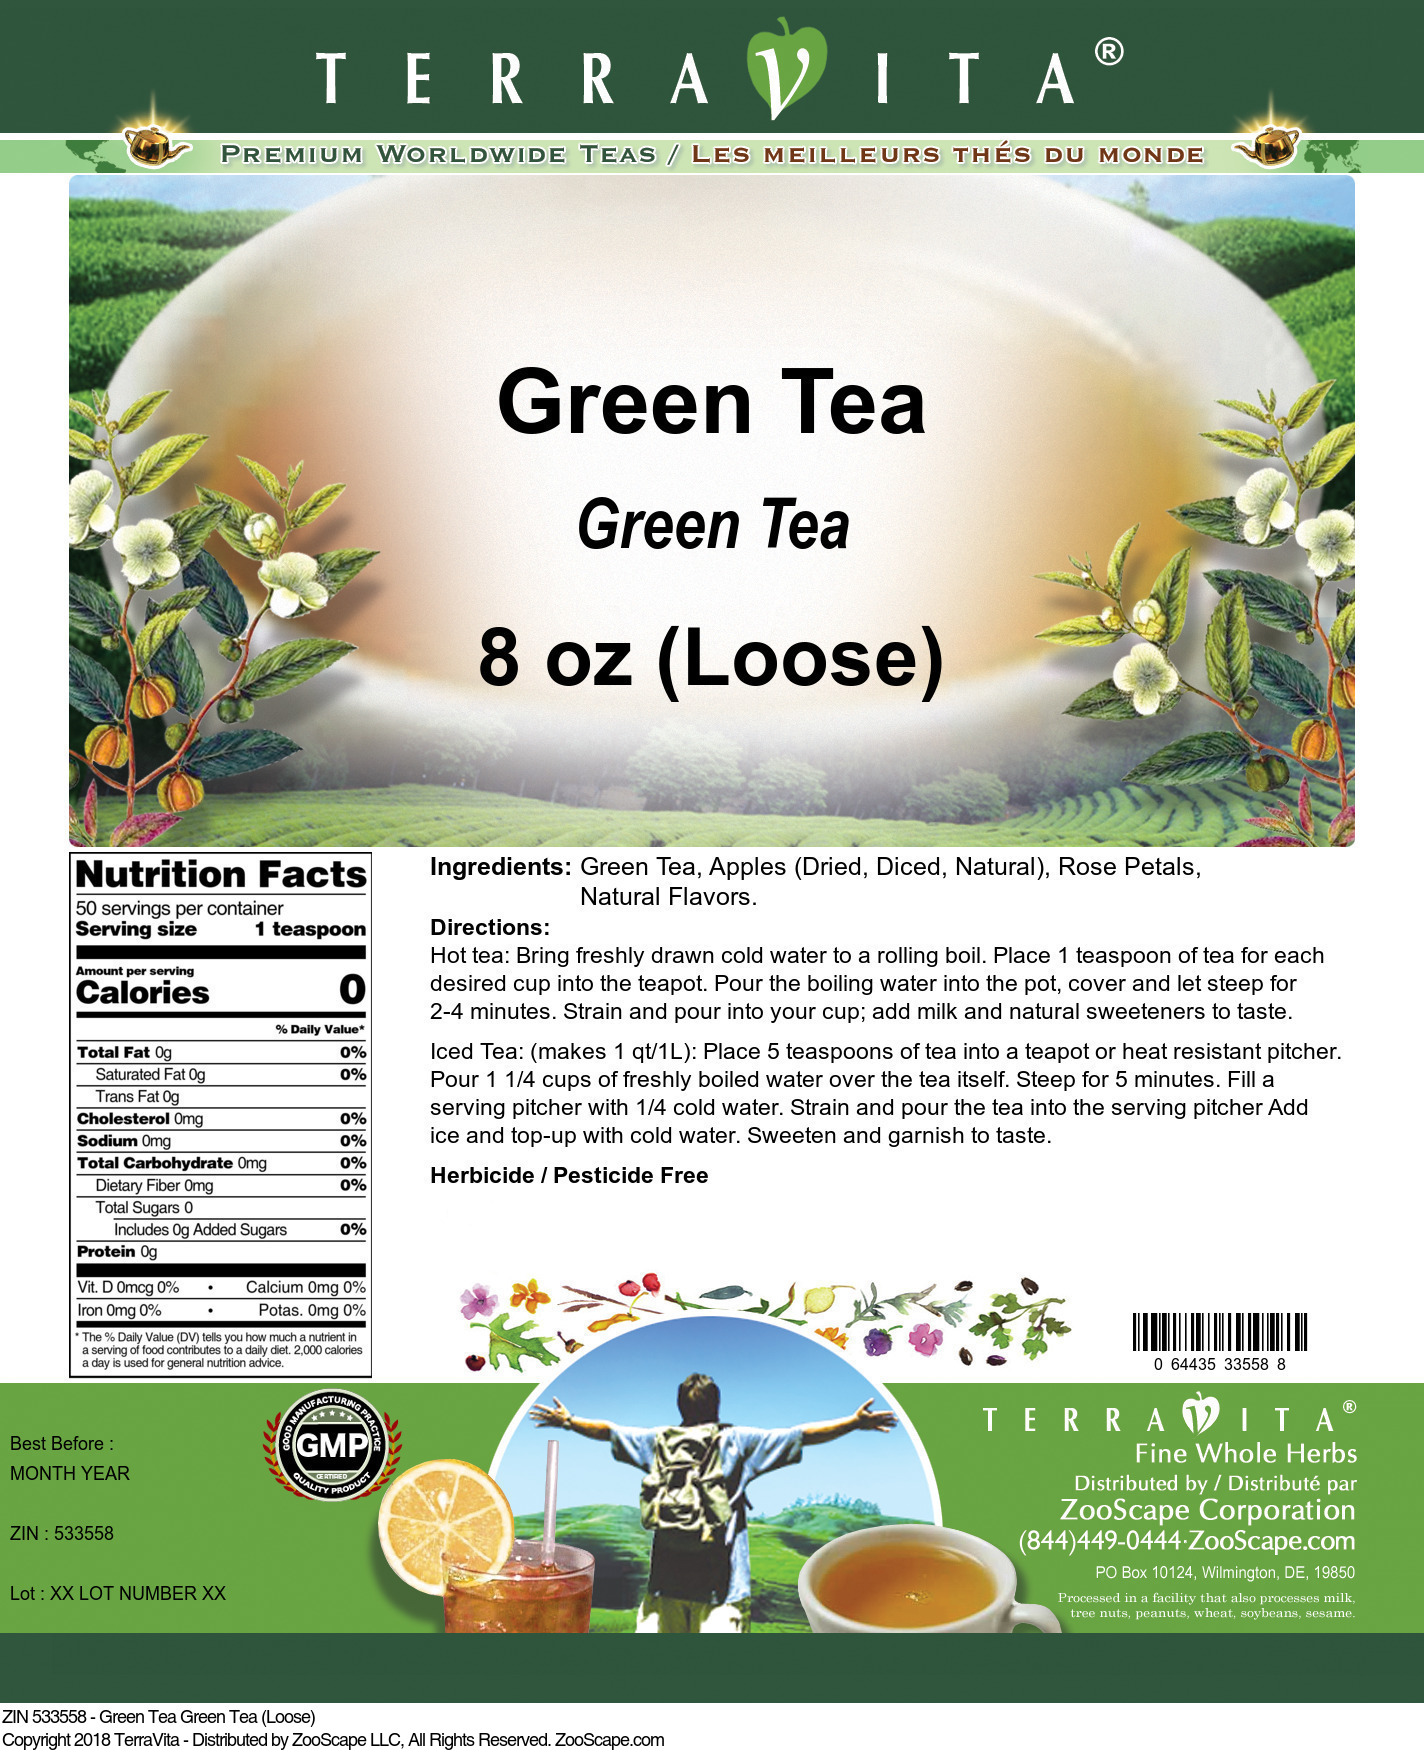 Green Tea Green Tea (Loose)